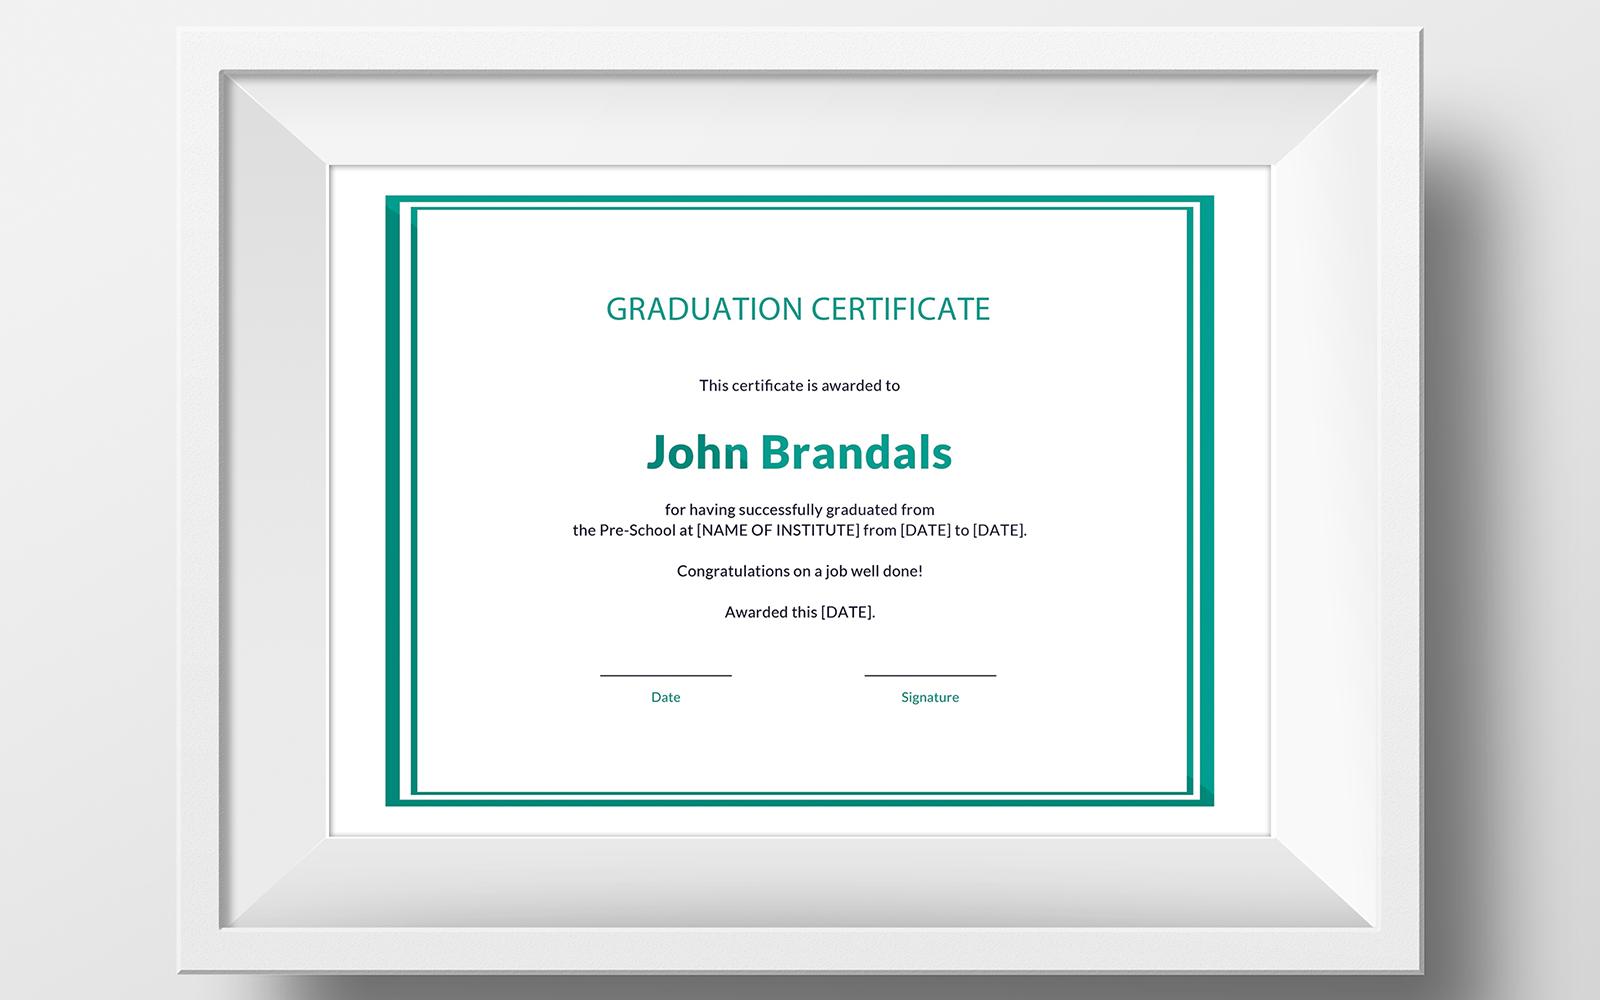 Free High School Graduation Certificate Template #116141